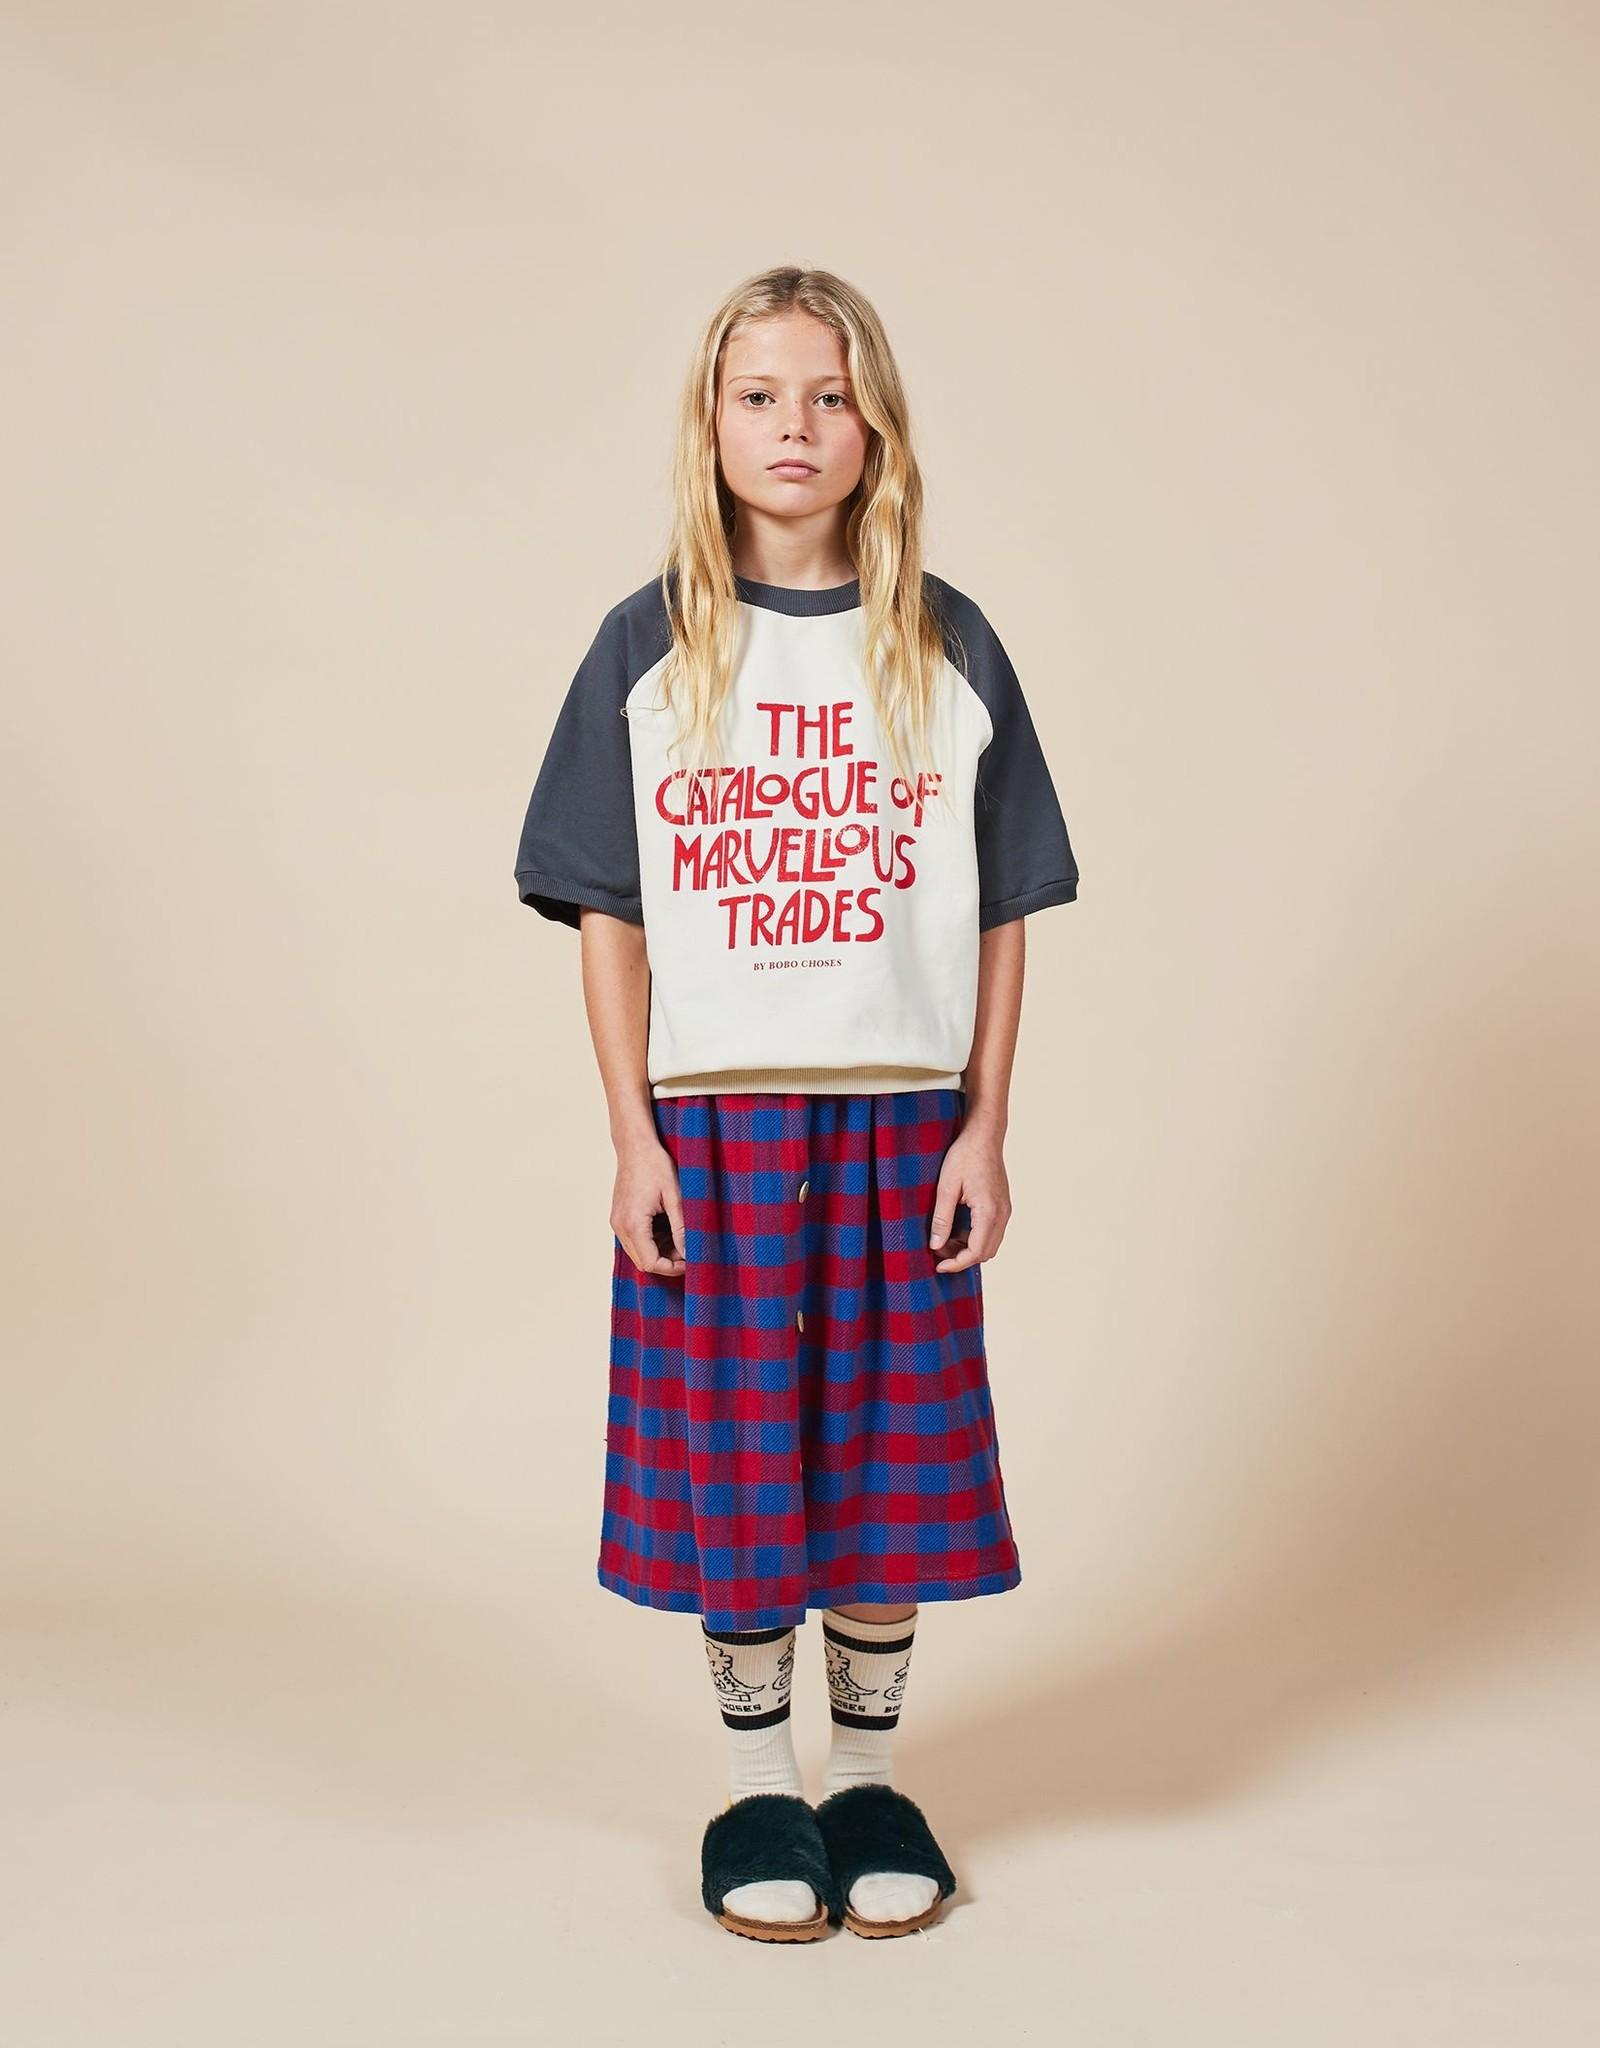 Bobo Choses - Catalogue Of Marvellous Trades Sweatshirt